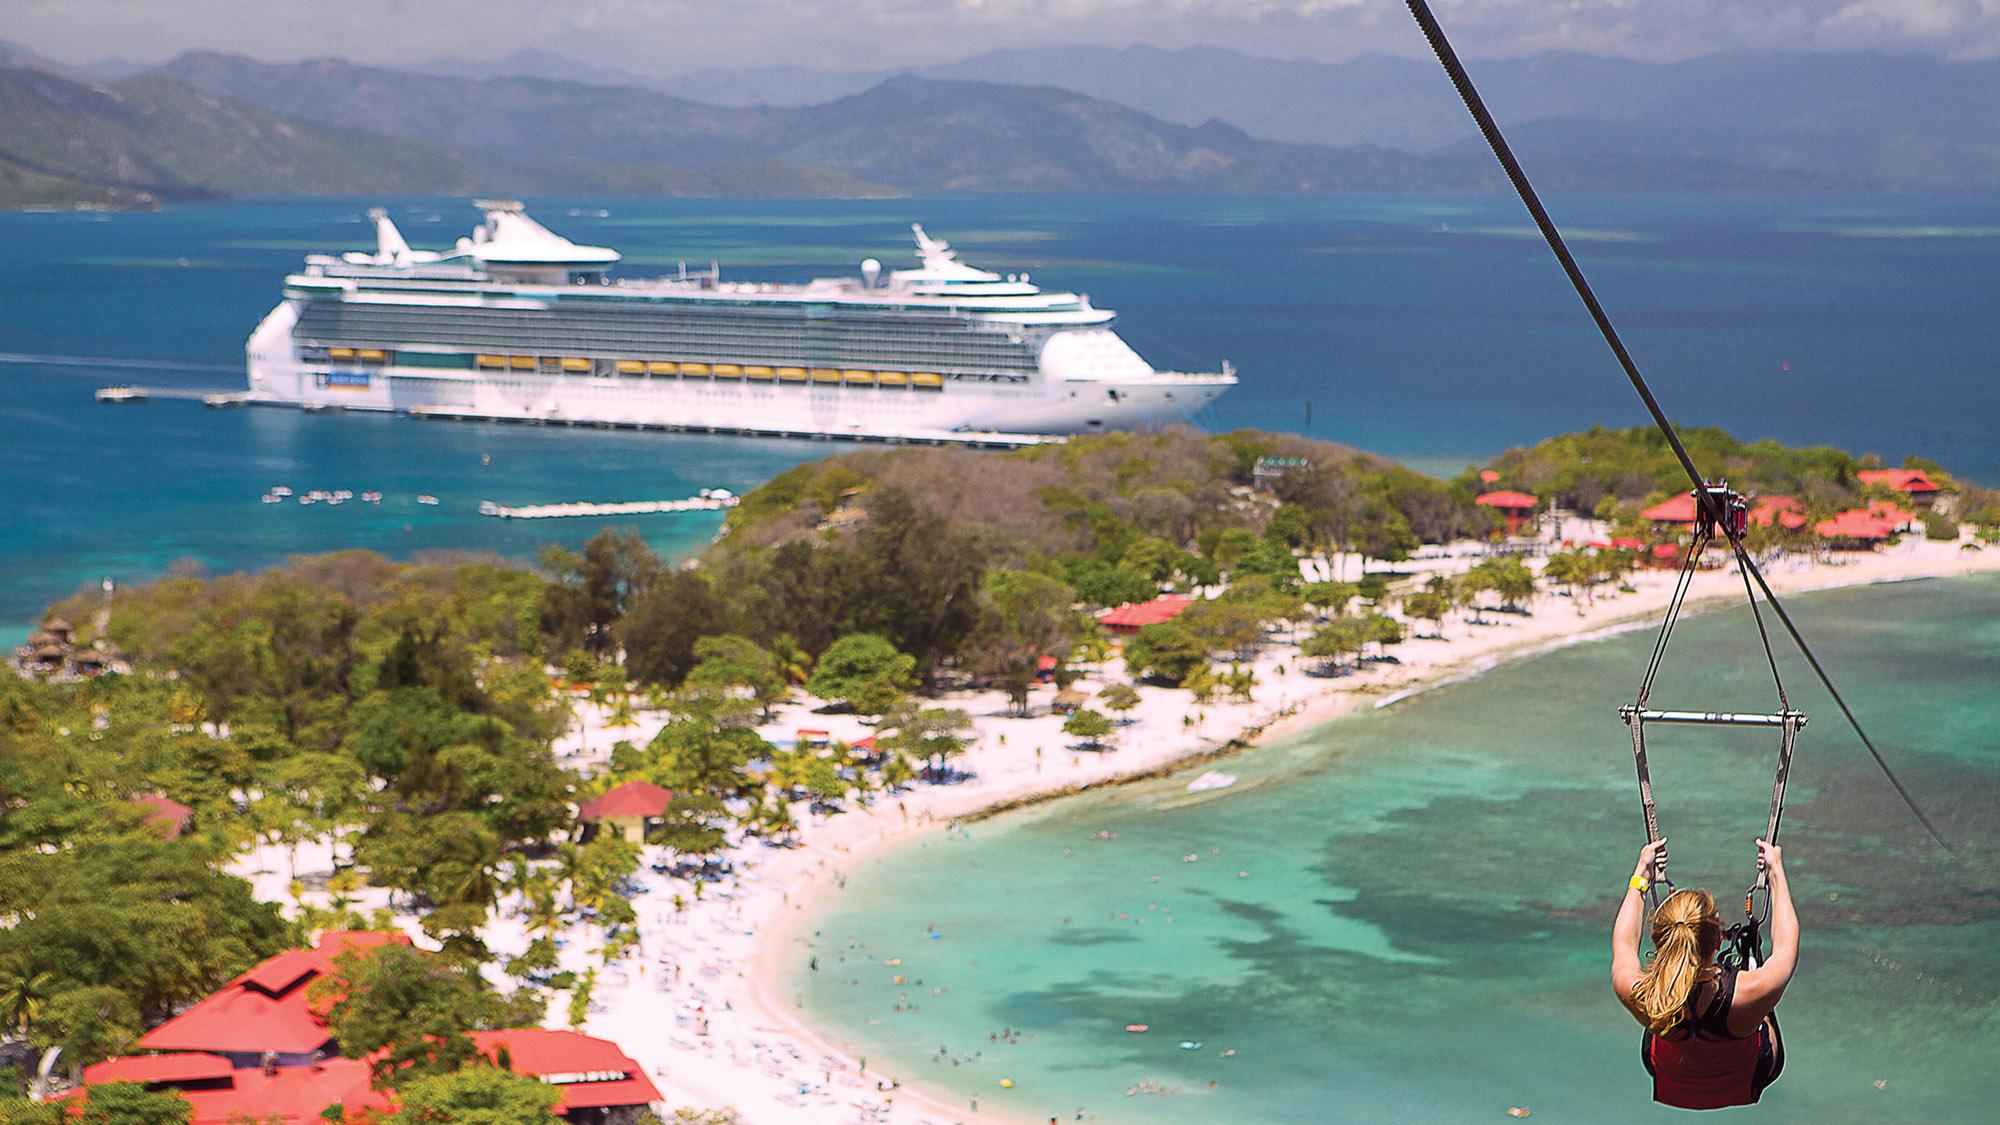 Ziplining on Labadee, Royal Caribbean International's original private destination.